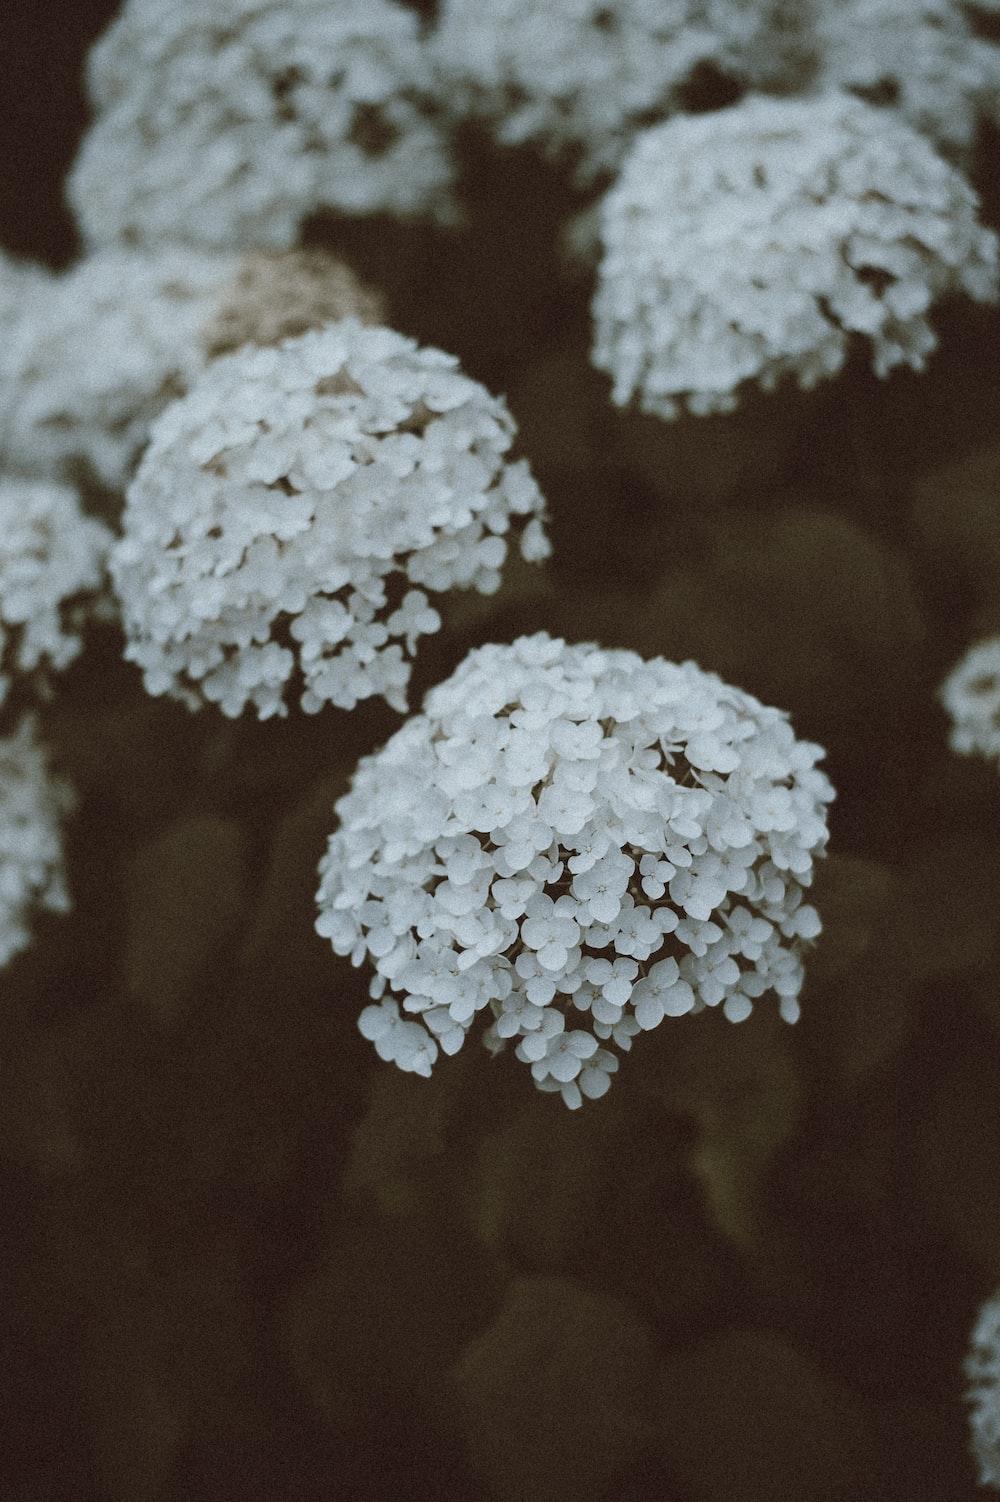 Flower Petals Plant And White Hd Photo By Annie Spratt